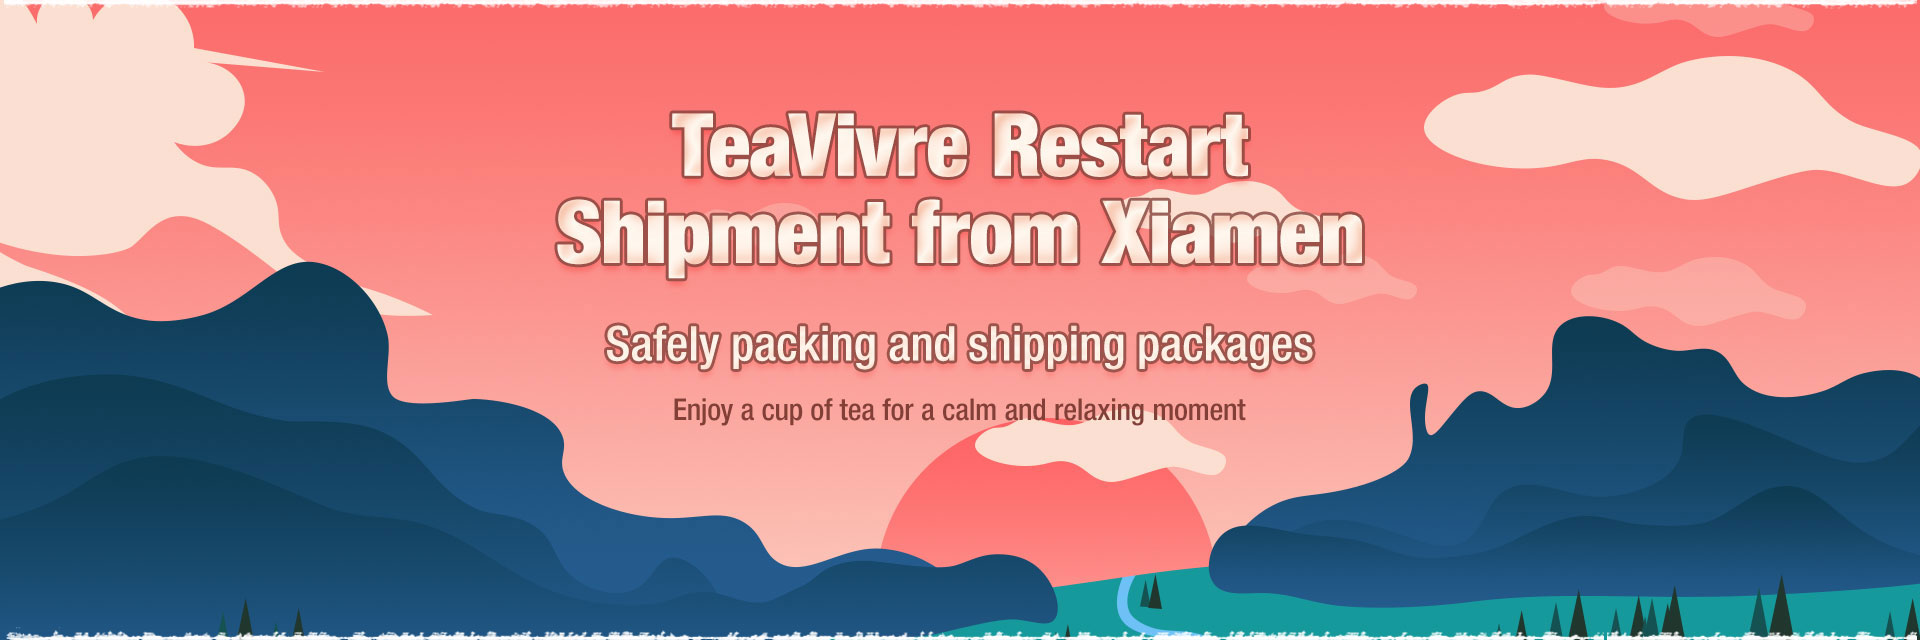 TeaVivre Restart Shipment from Xiamen